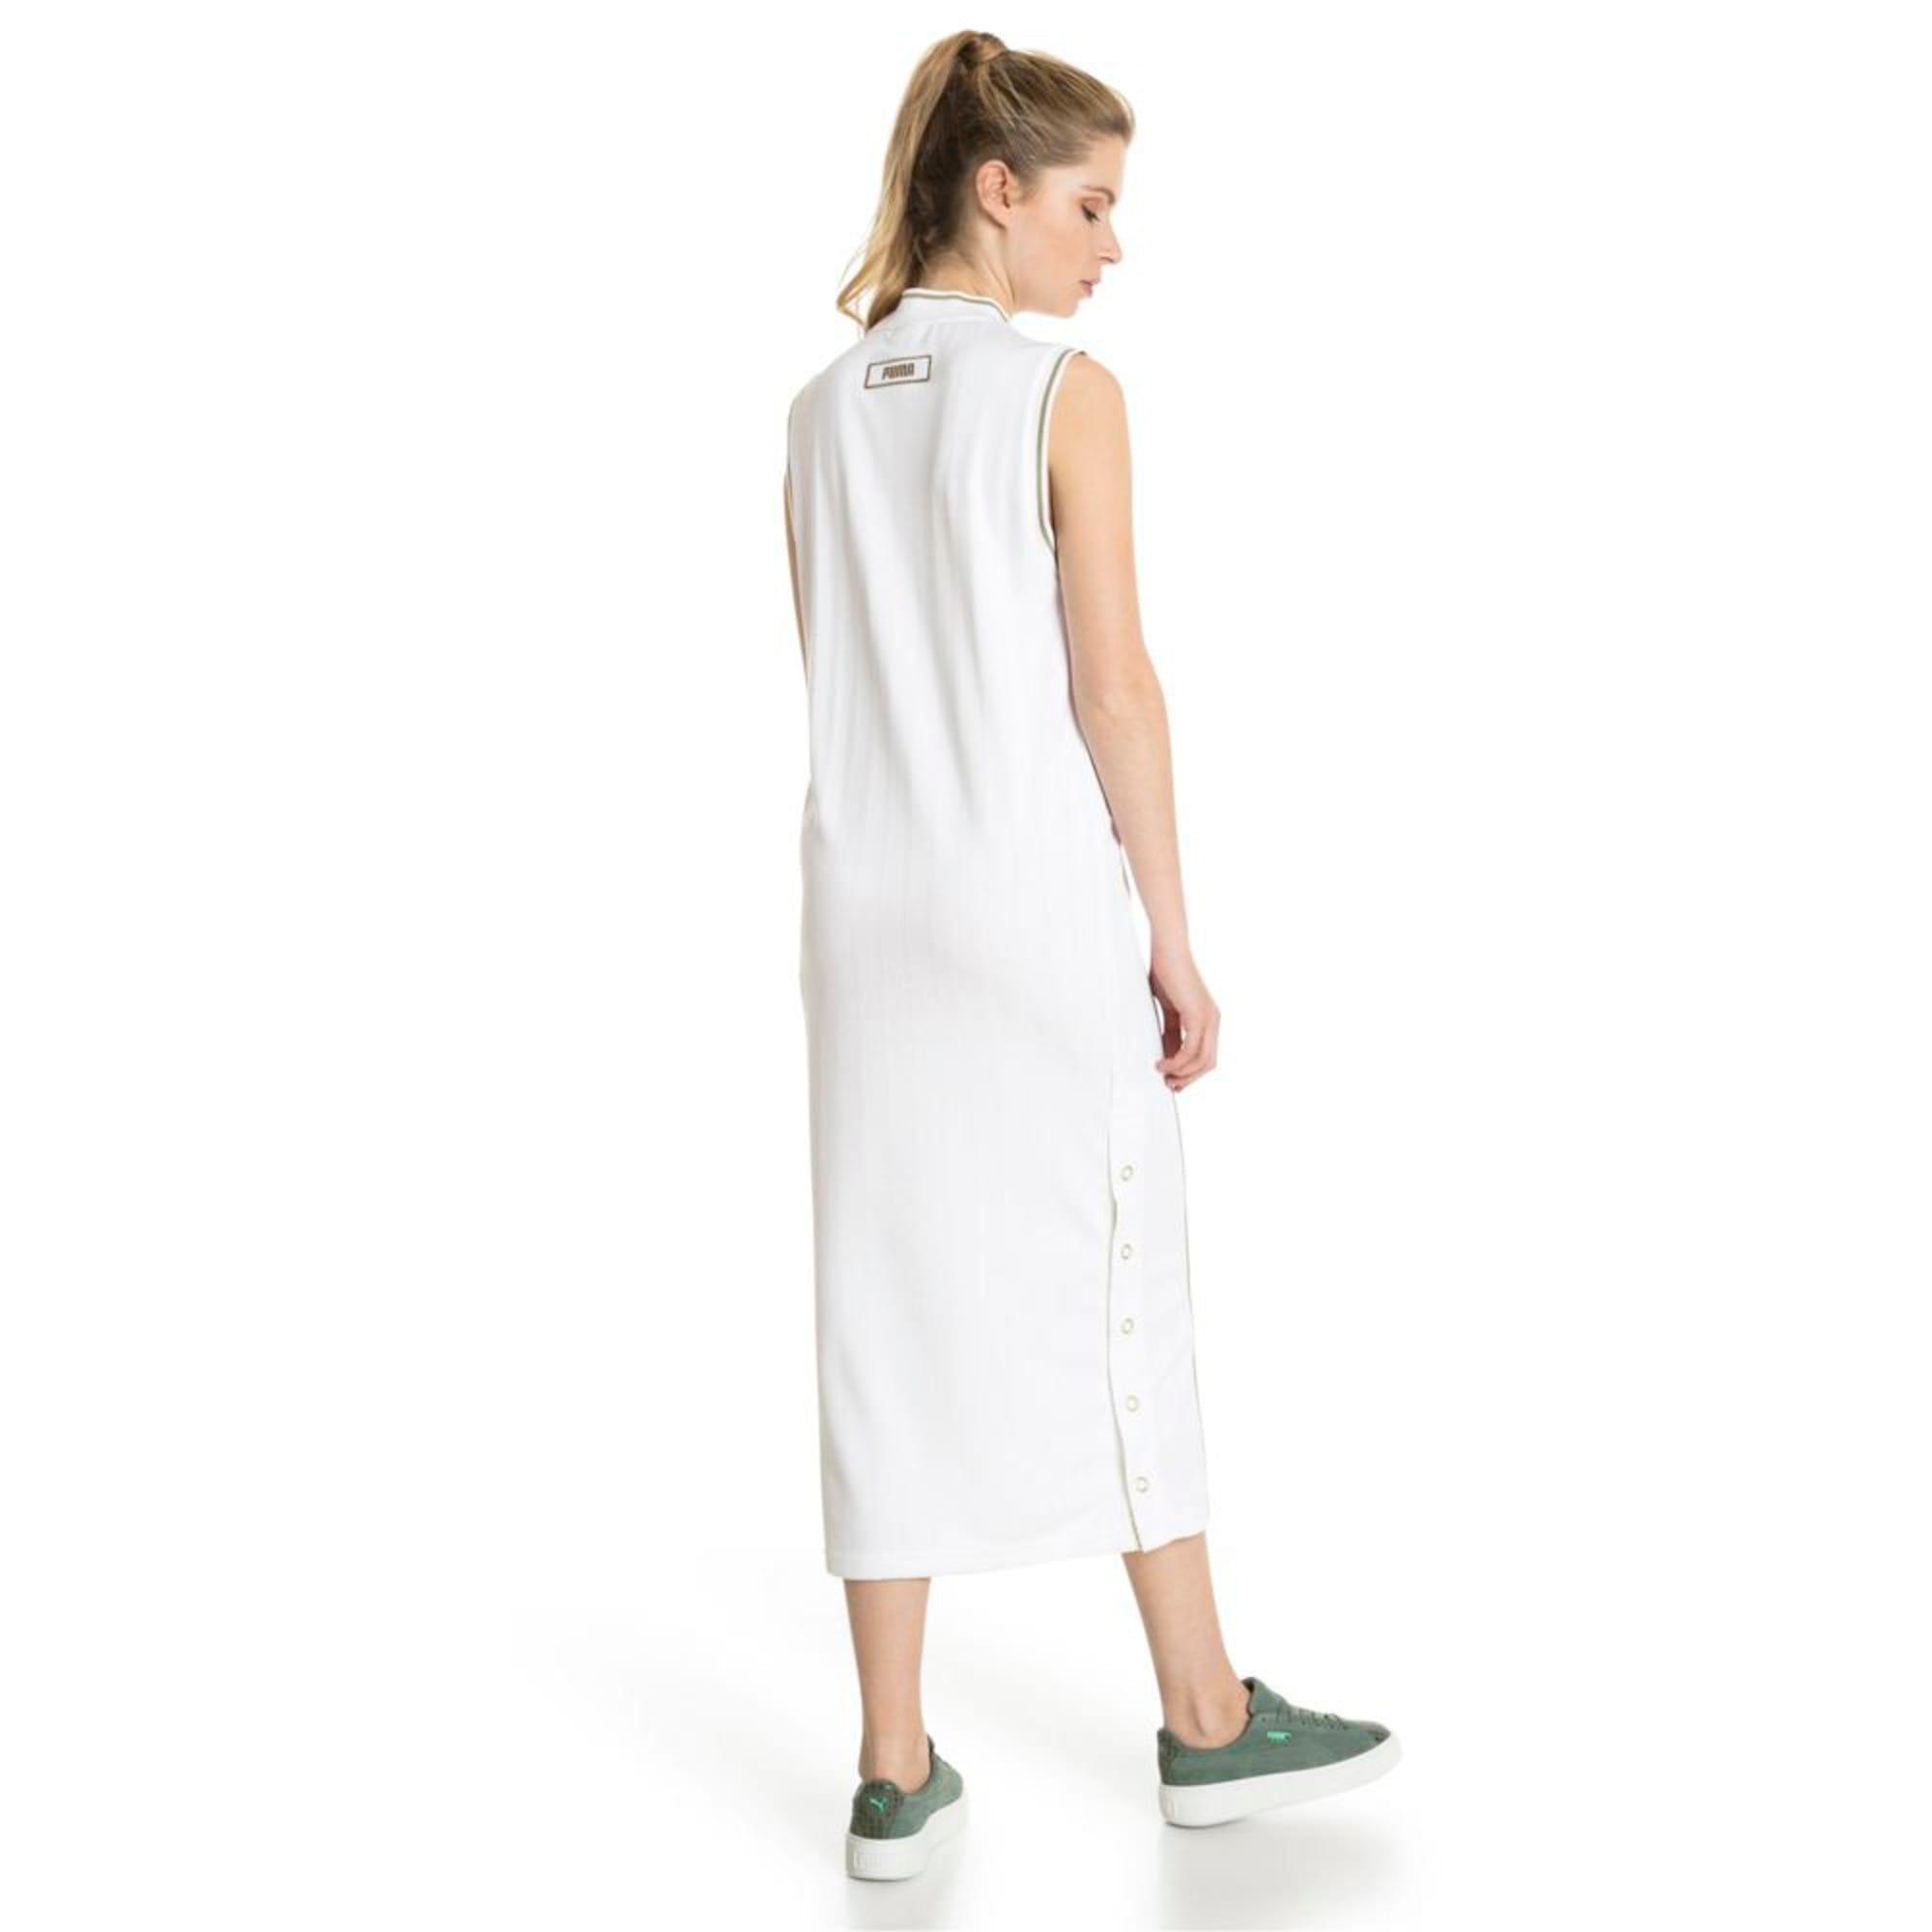 Thumbnail 5 of Retro Women's Dress, Puma White, medium-IND